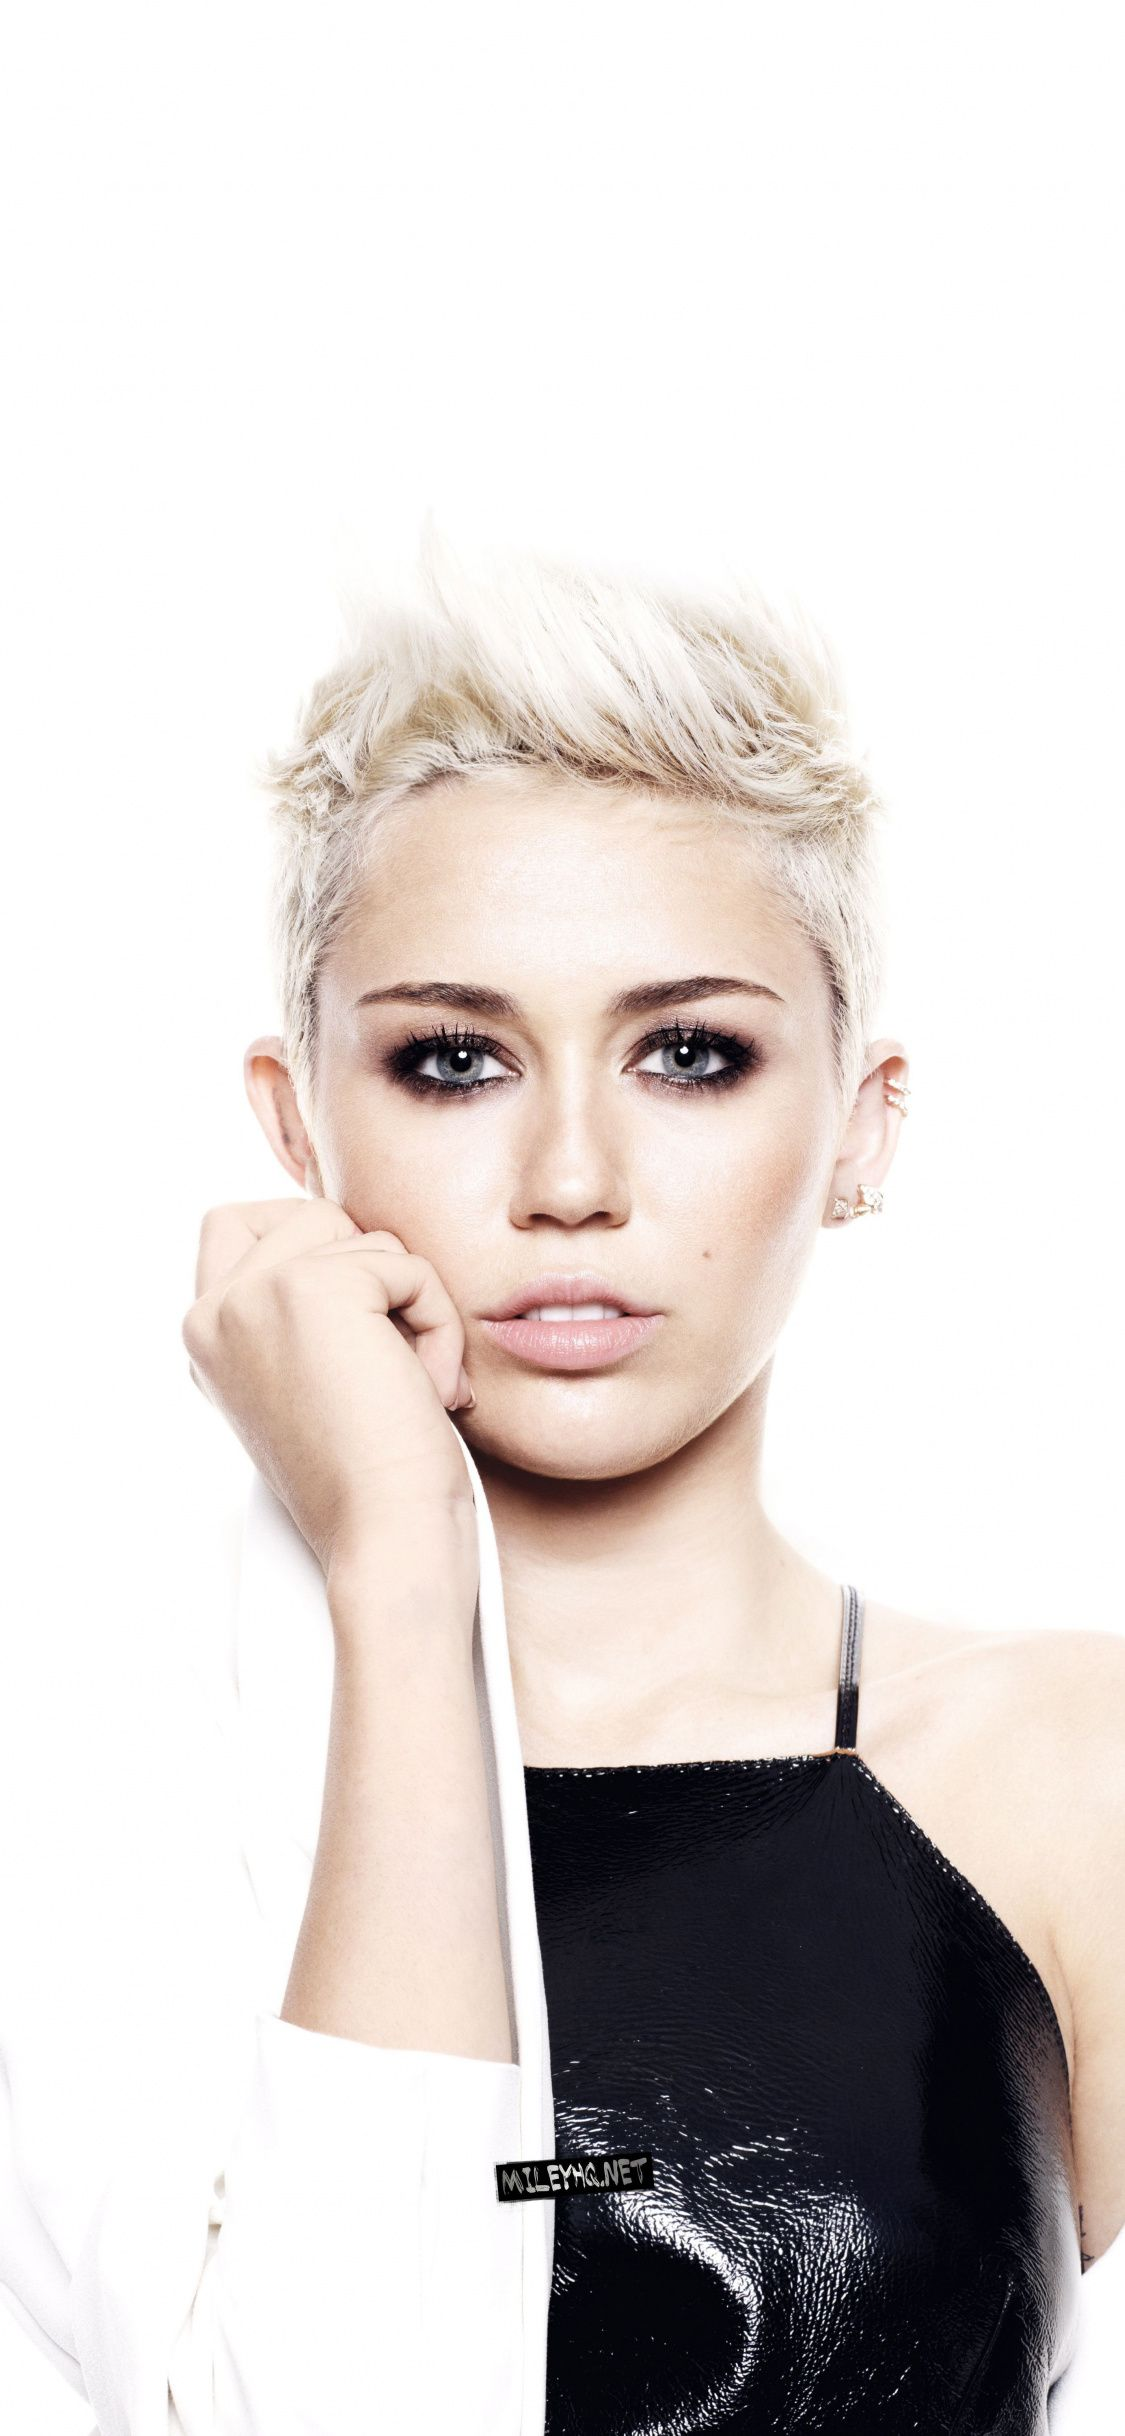 Miley Cyrus Short Hair 2018 1125x2436 Wallpaper Short Hair S